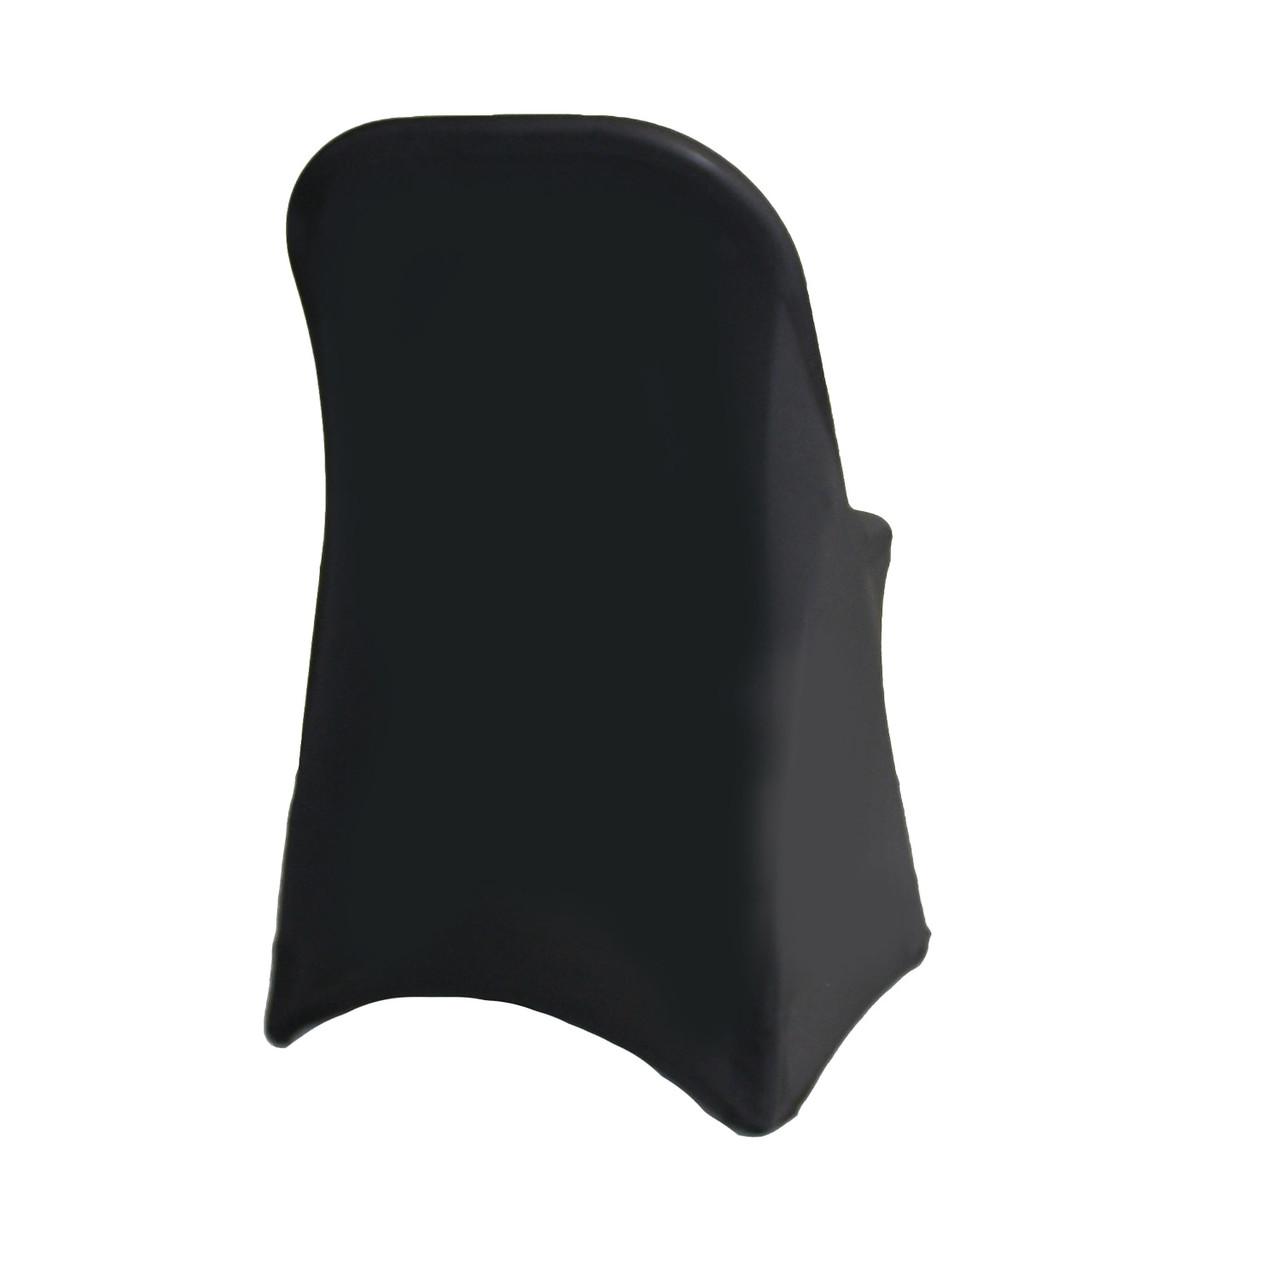 Pleasing Stretch Spandex Folding Chair Cover Black Bralicious Painted Fabric Chair Ideas Braliciousco